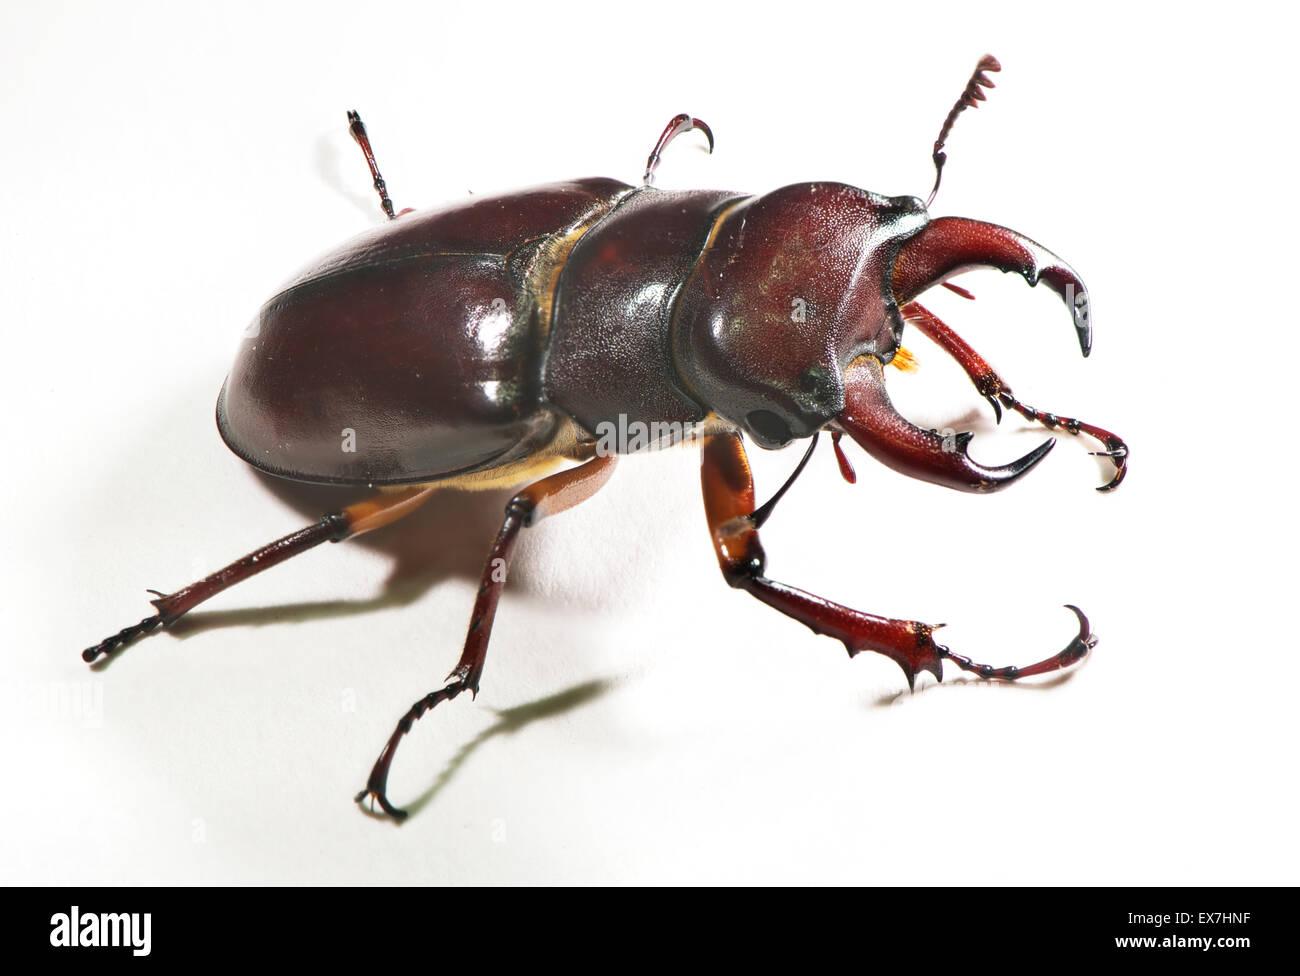 Lucanus capreolus, the reddish-brown stag beetle. - Stock Image